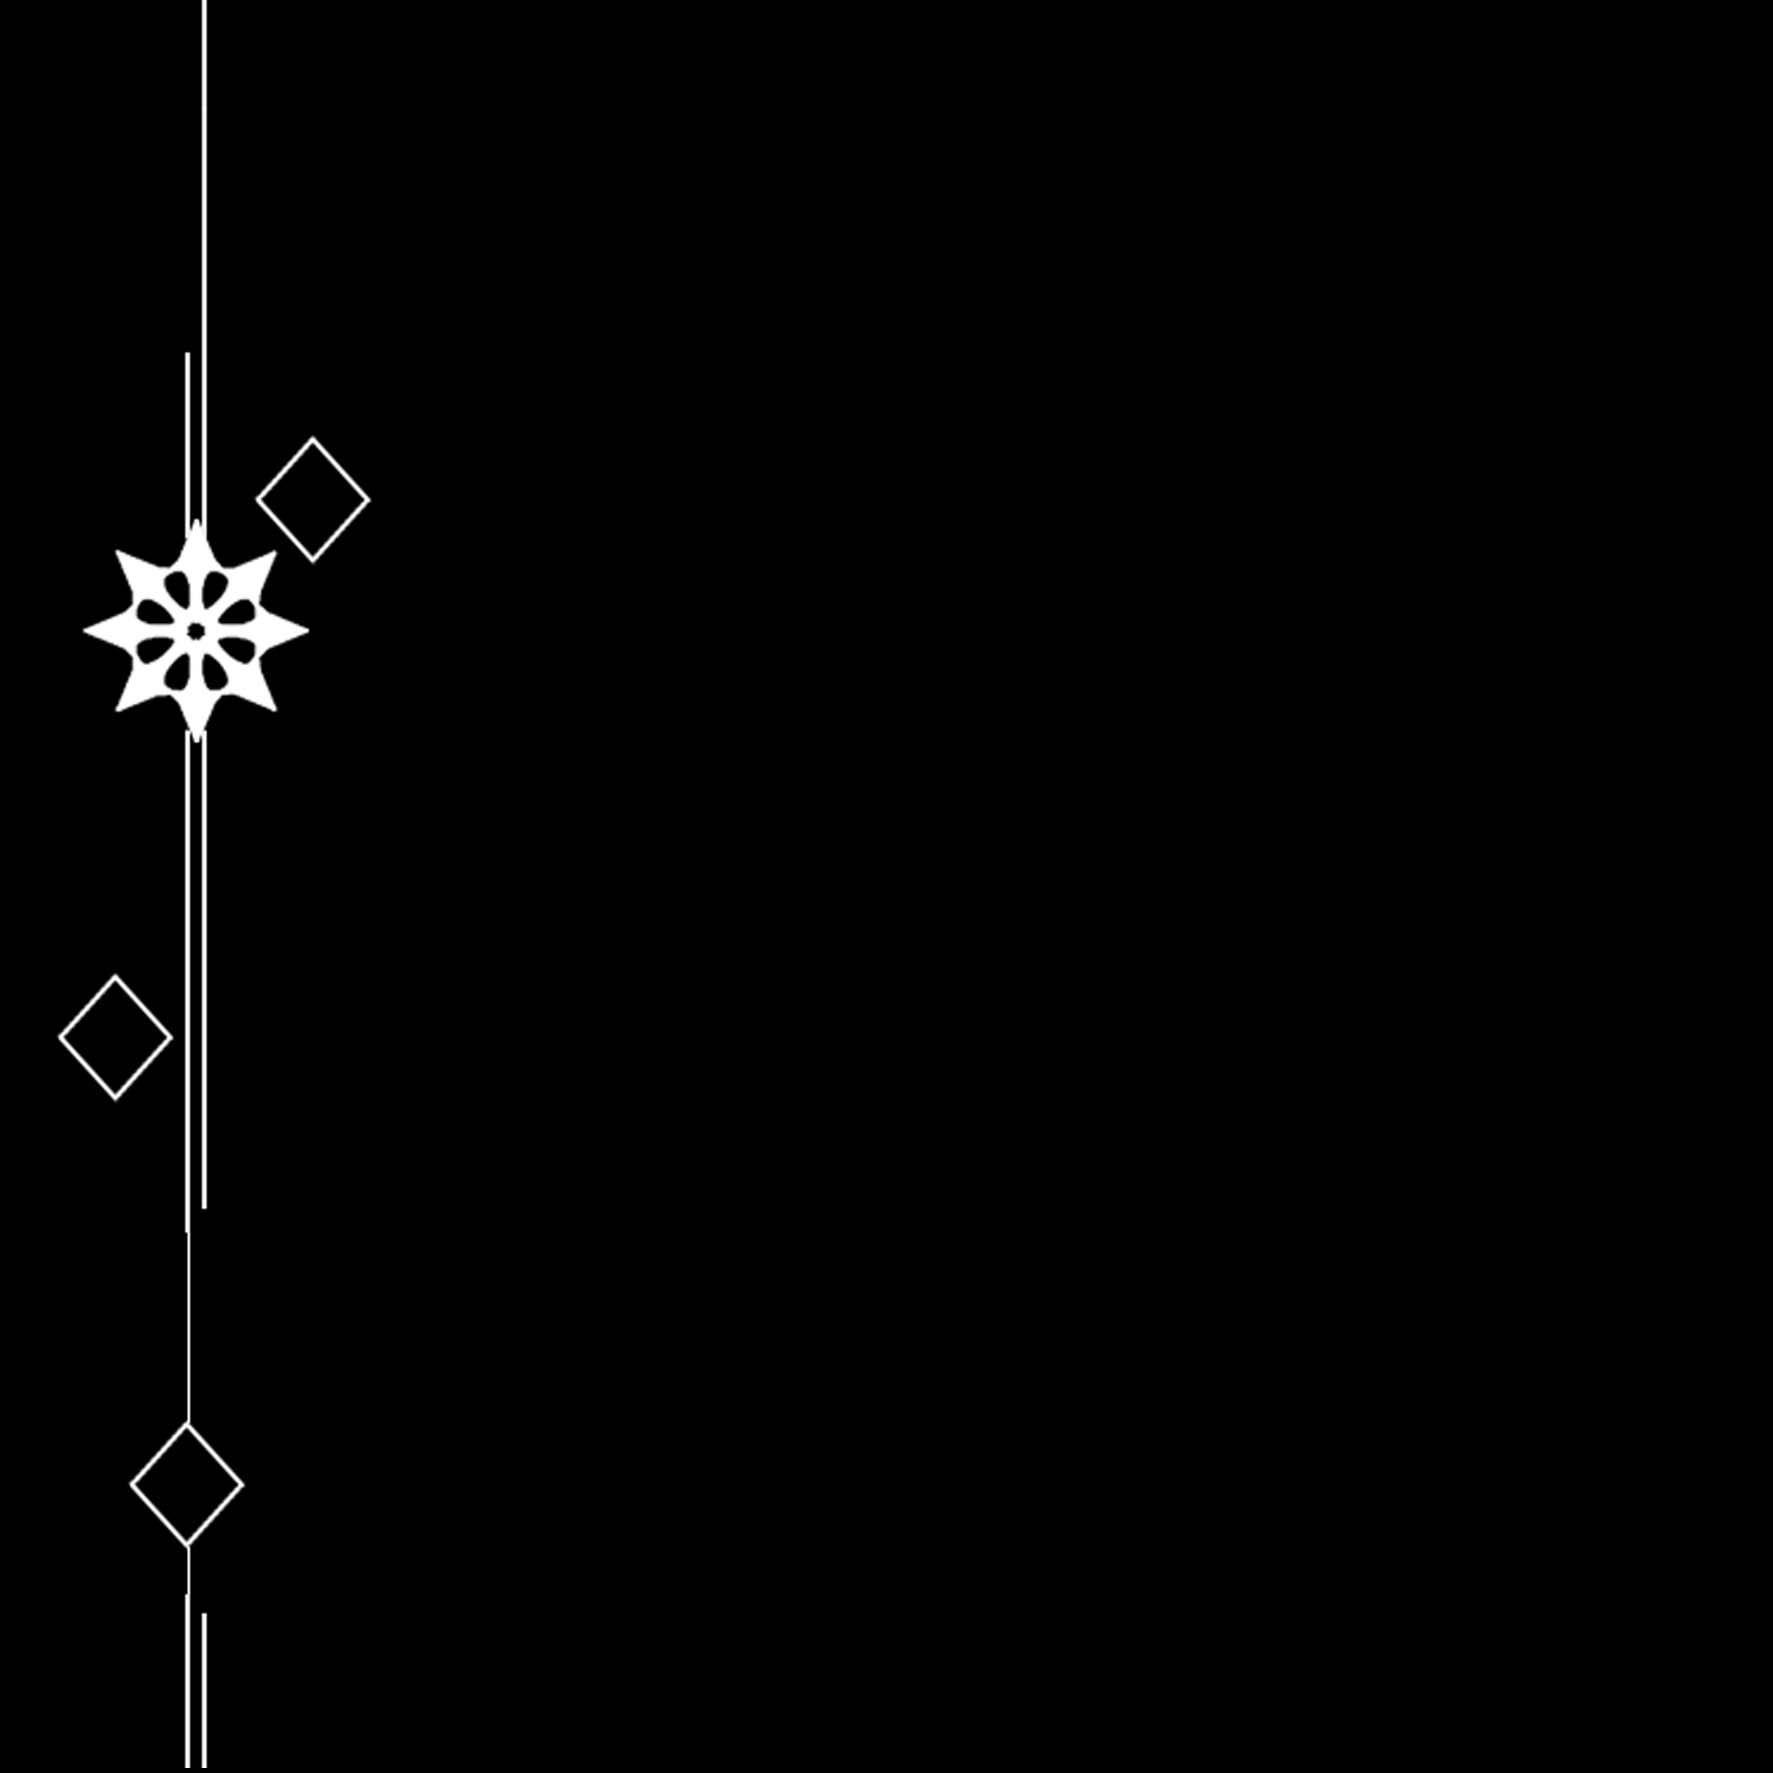 White Line Border Page Borders Design Decorative Lines Png Text